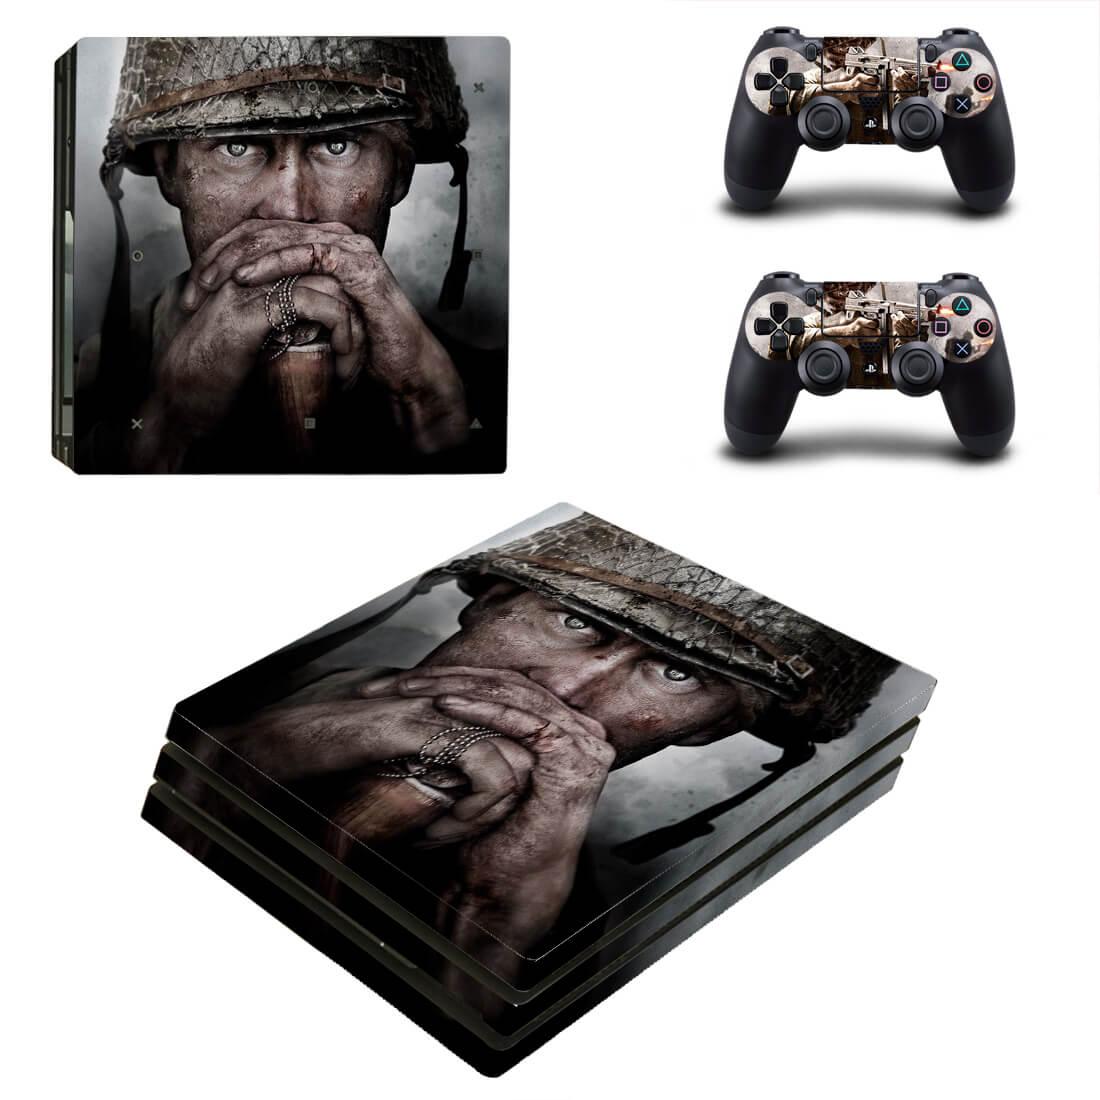 COD WW2 PS4 Pro skin